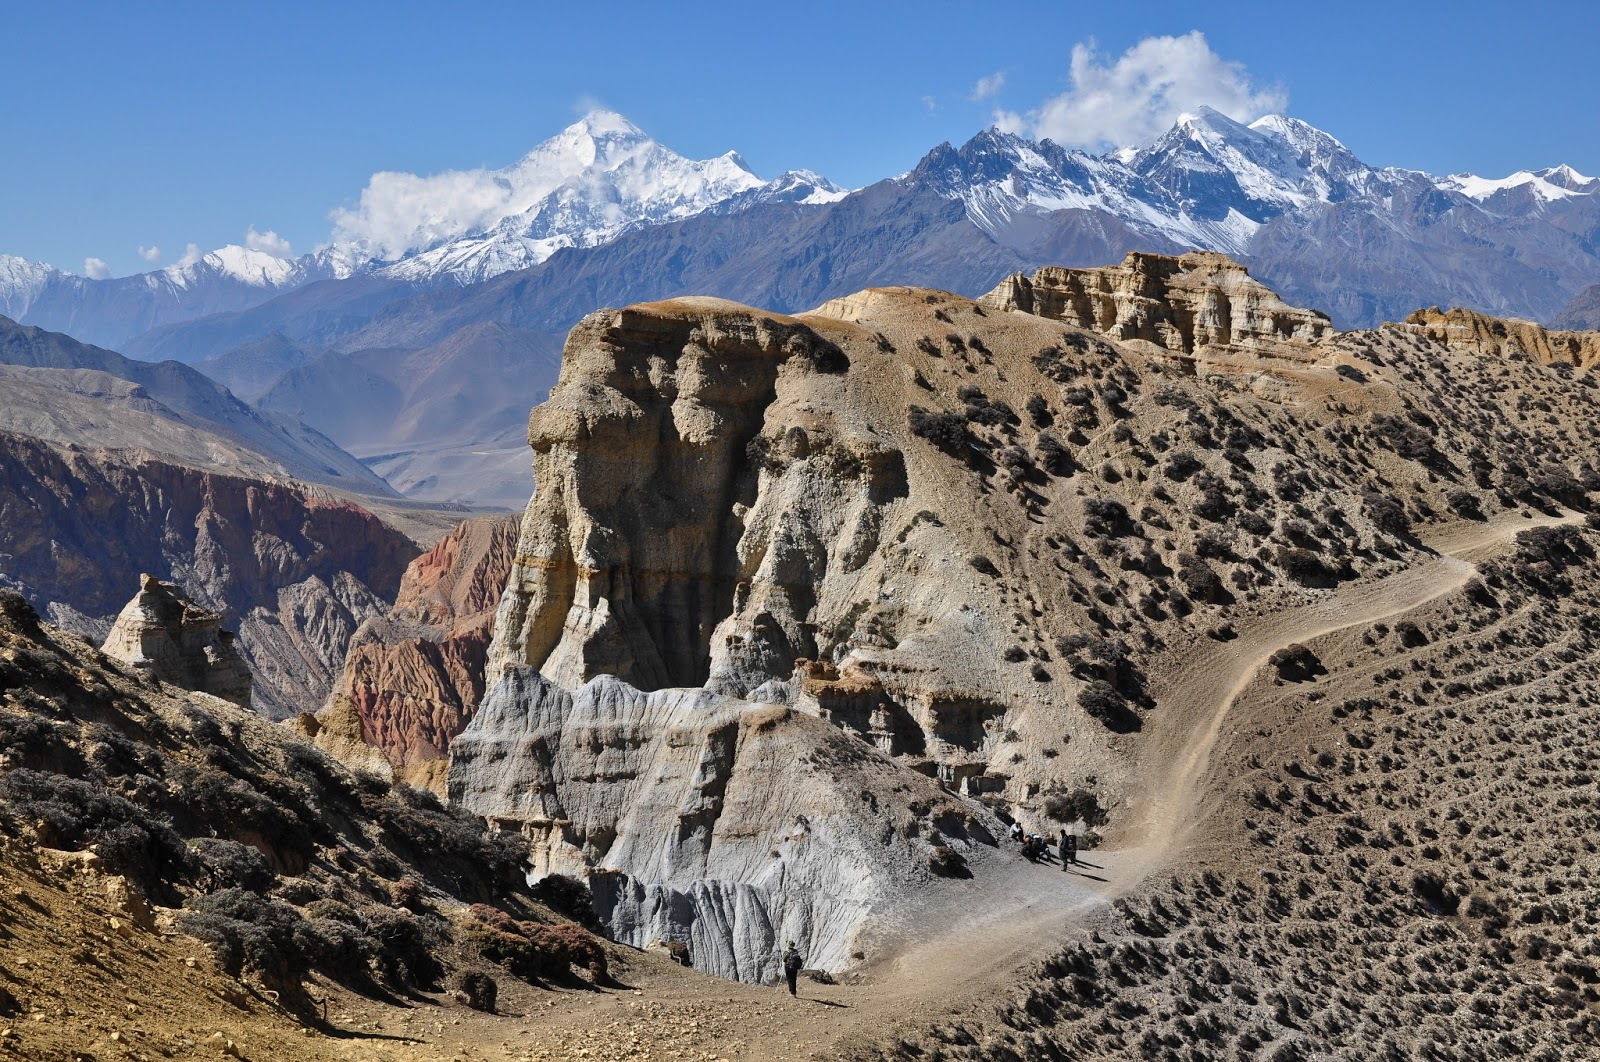 NEPAL TREKKING GUIDE Trek Trekking Guide In Nepal Freelancer Trekking Guide In Nepal bestguide